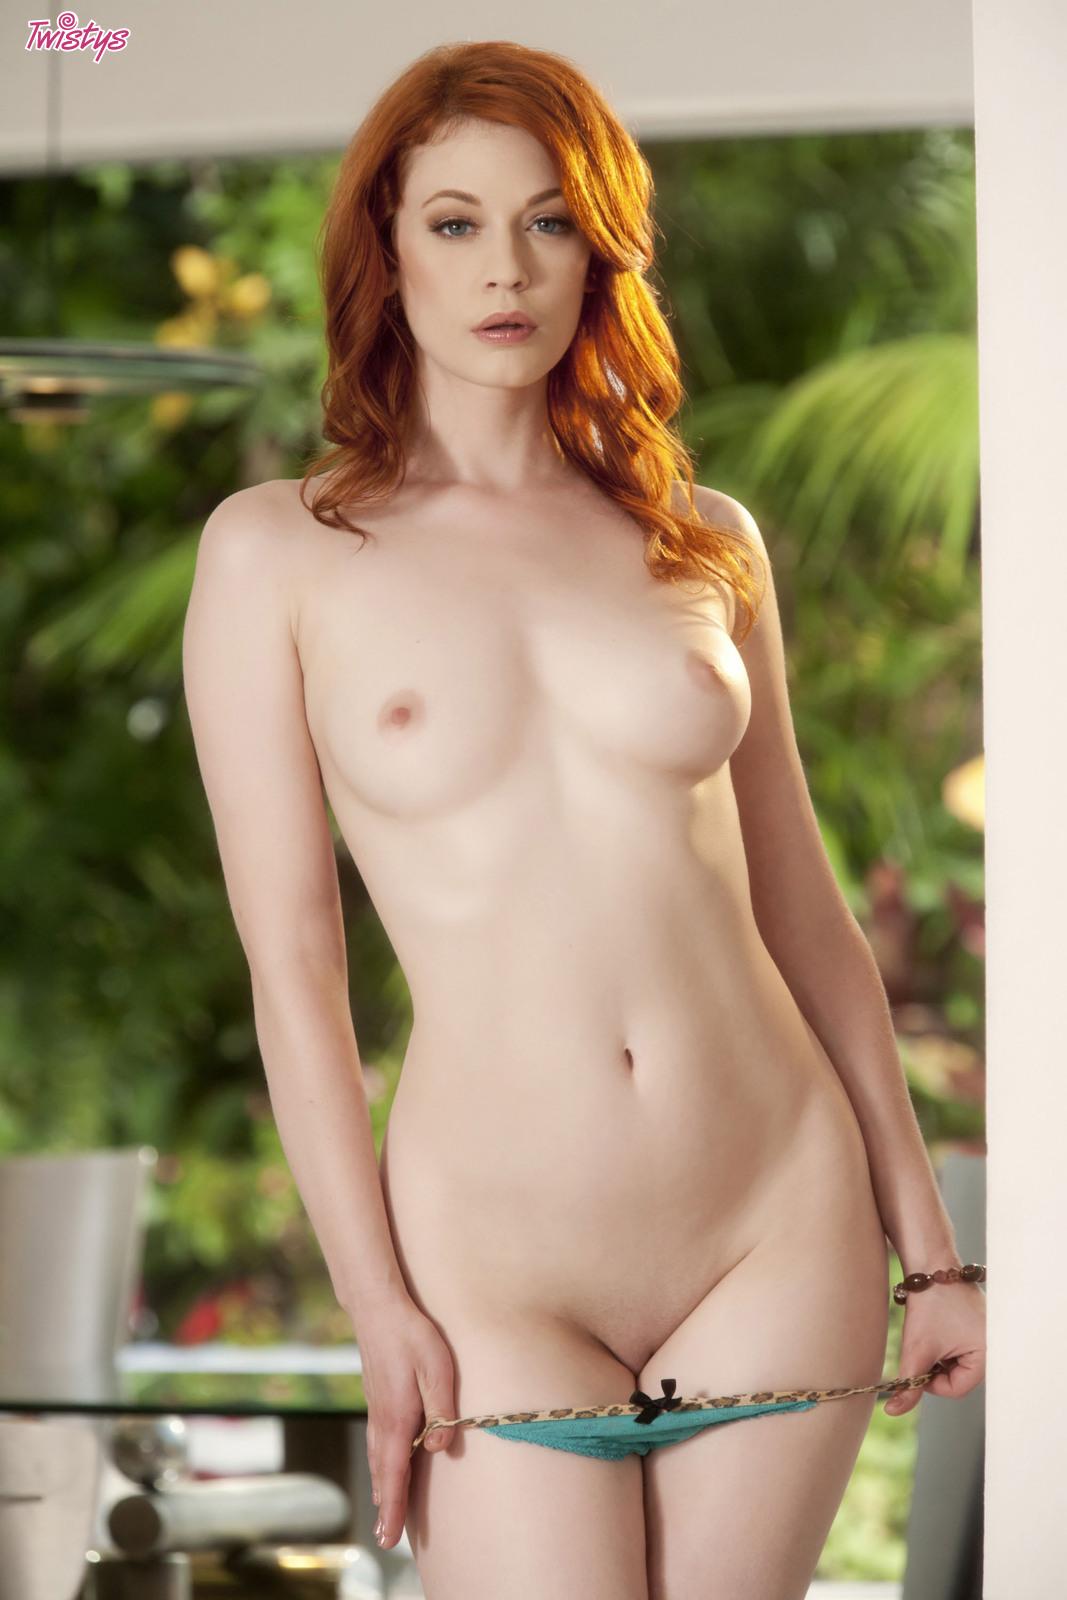 4206973_138627785323_baldcunt_erotiqlinks_greatass_JustineJoli_redhead_sexy.jpg